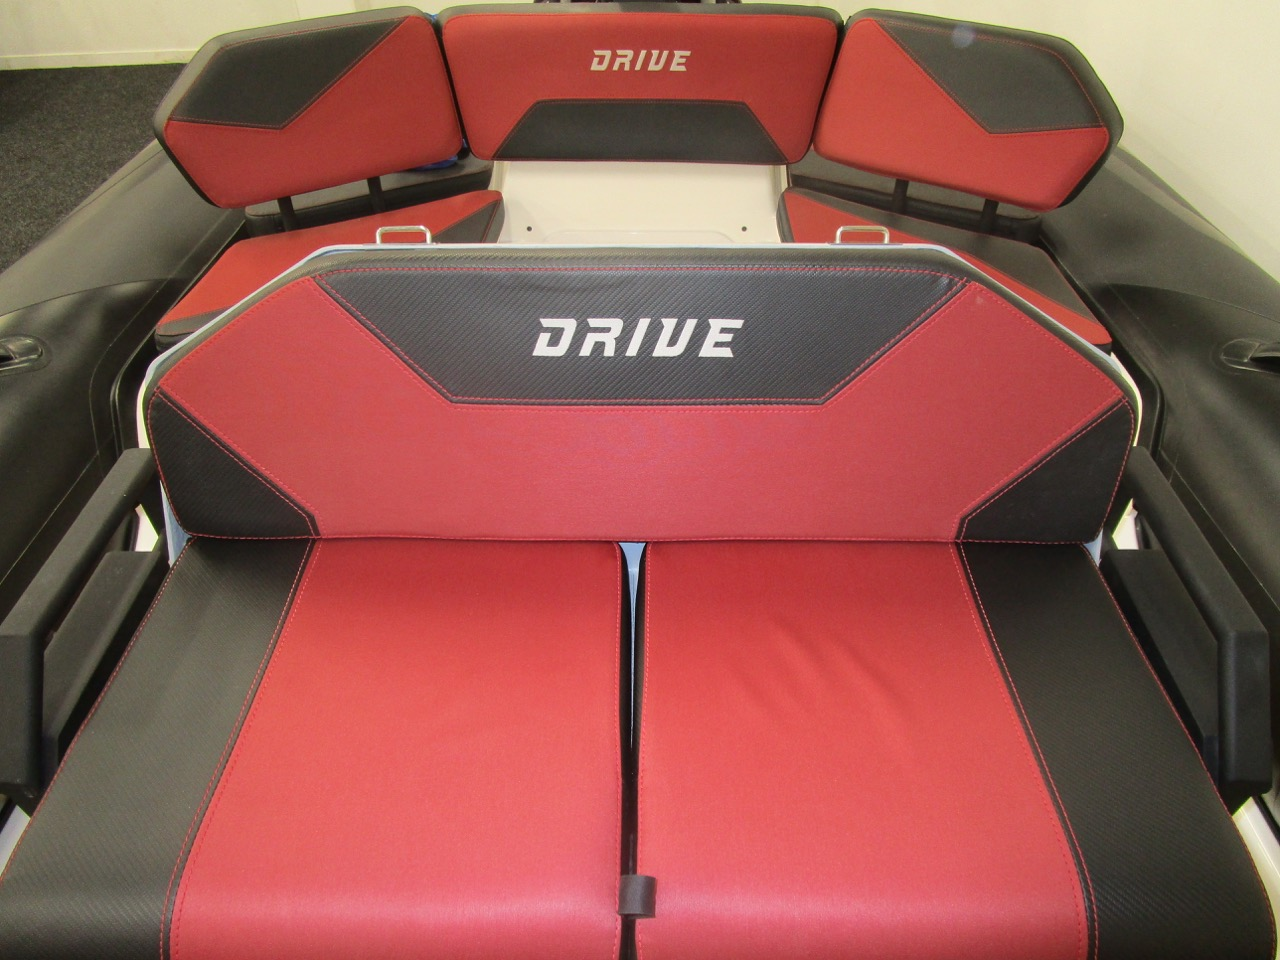 GRAND DRIVE D600 RIB helm and rear seats